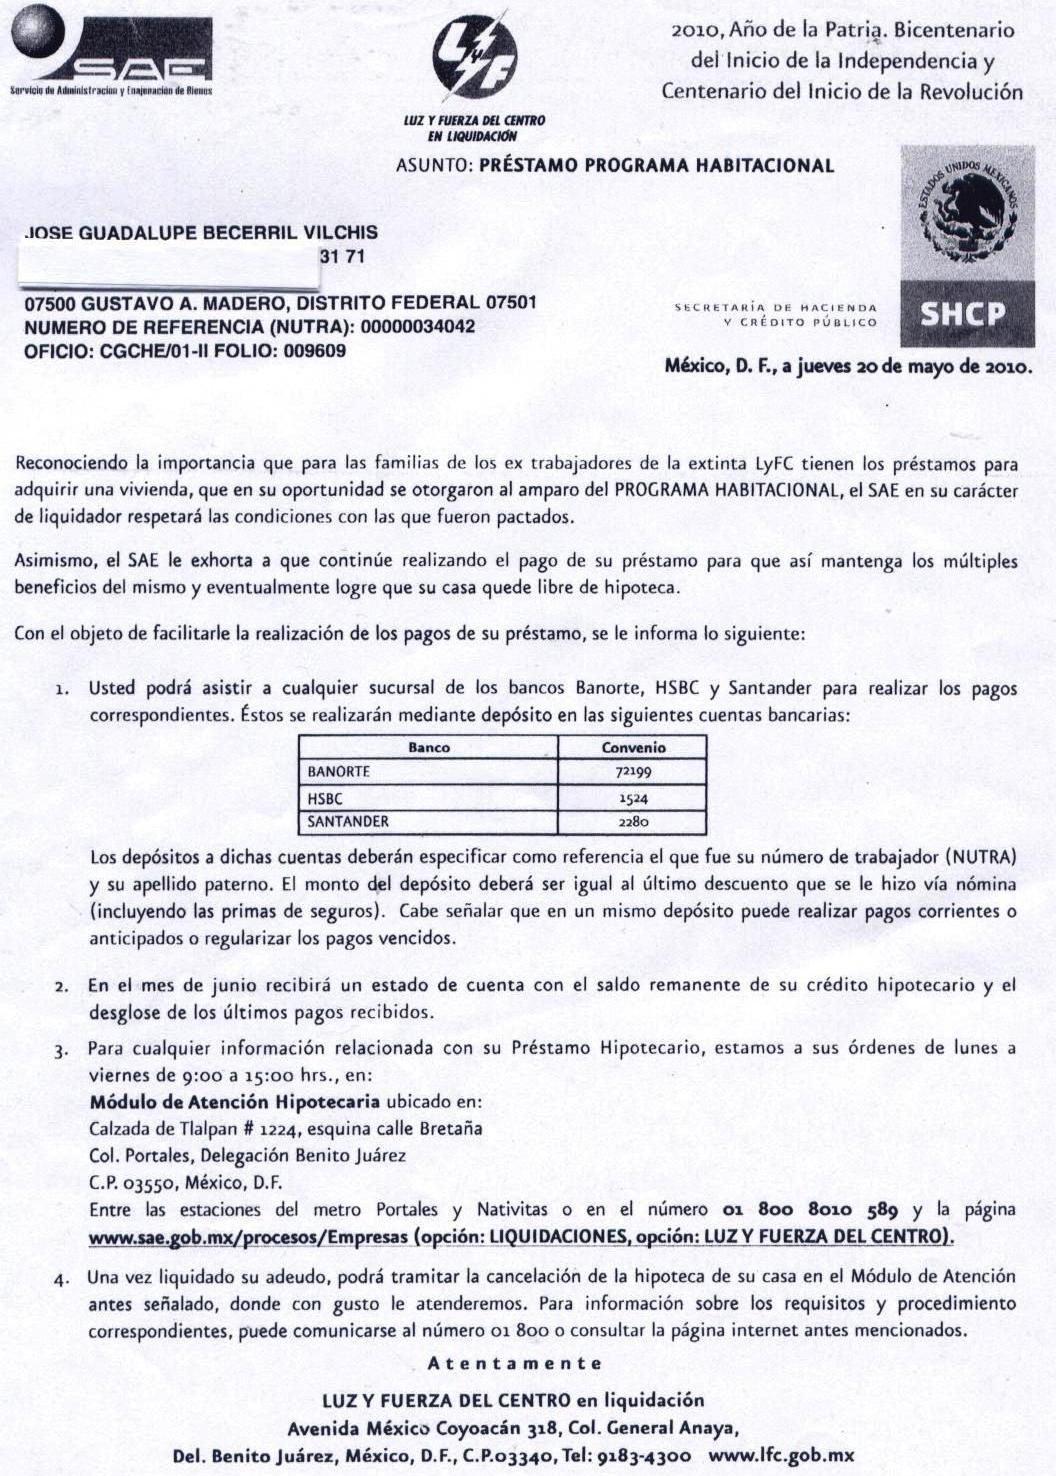 Sindicato Mexicano de Electricistas (Blog): 14-jun-2010